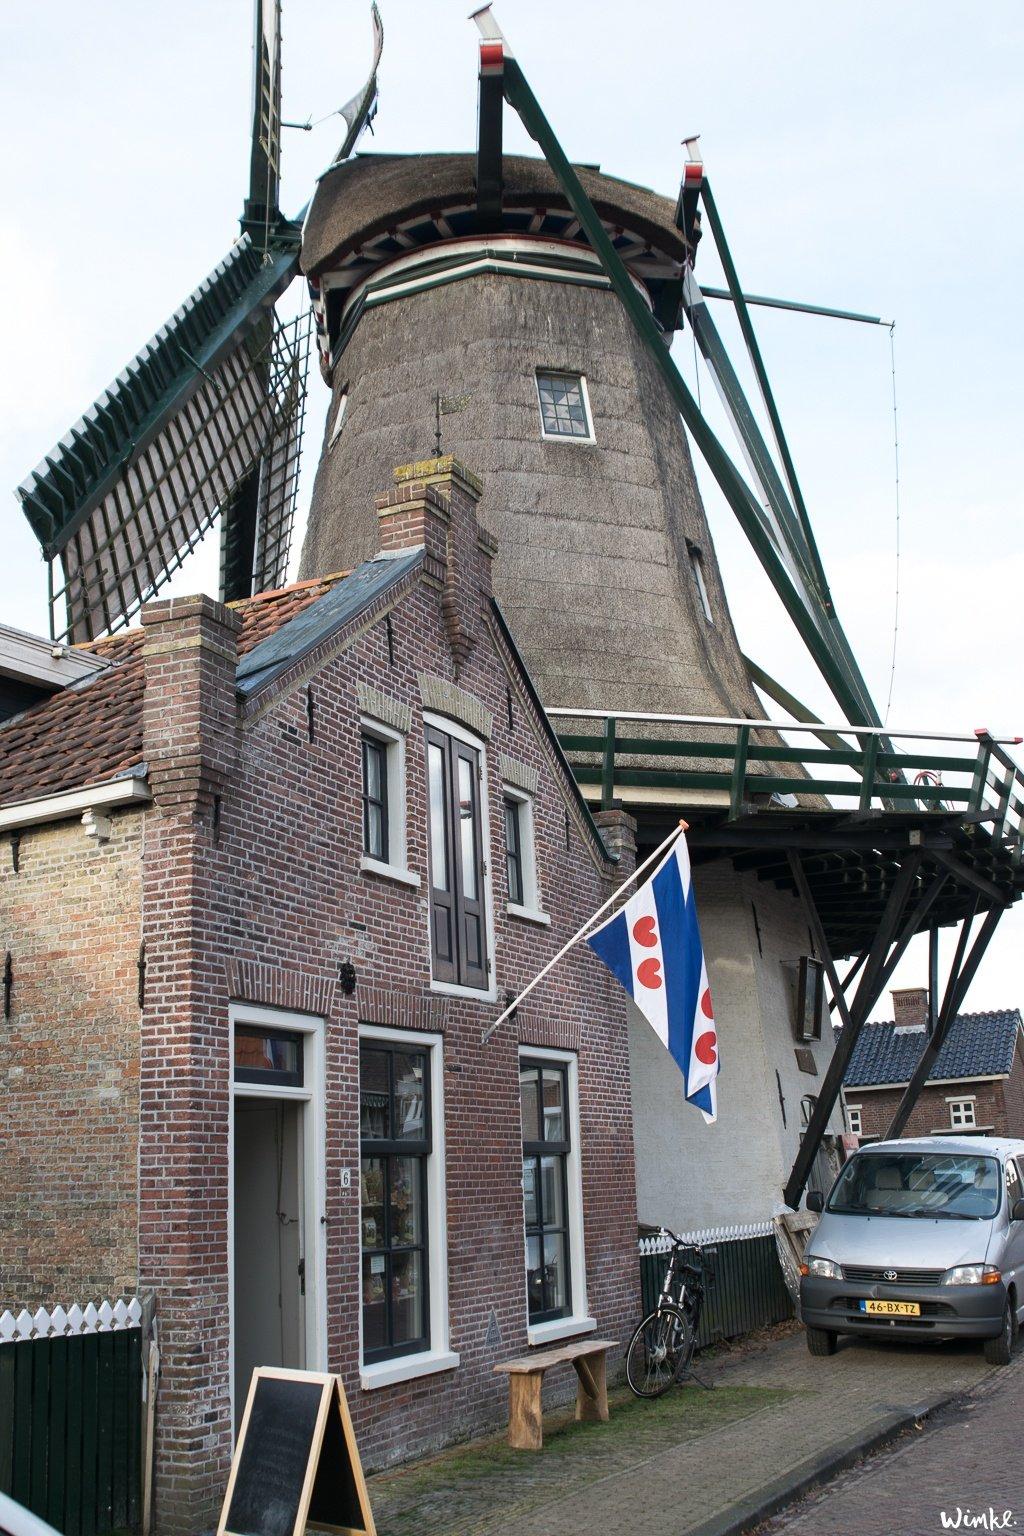 Fries geluk volgens Cees Noteboom - www.wimke.nl